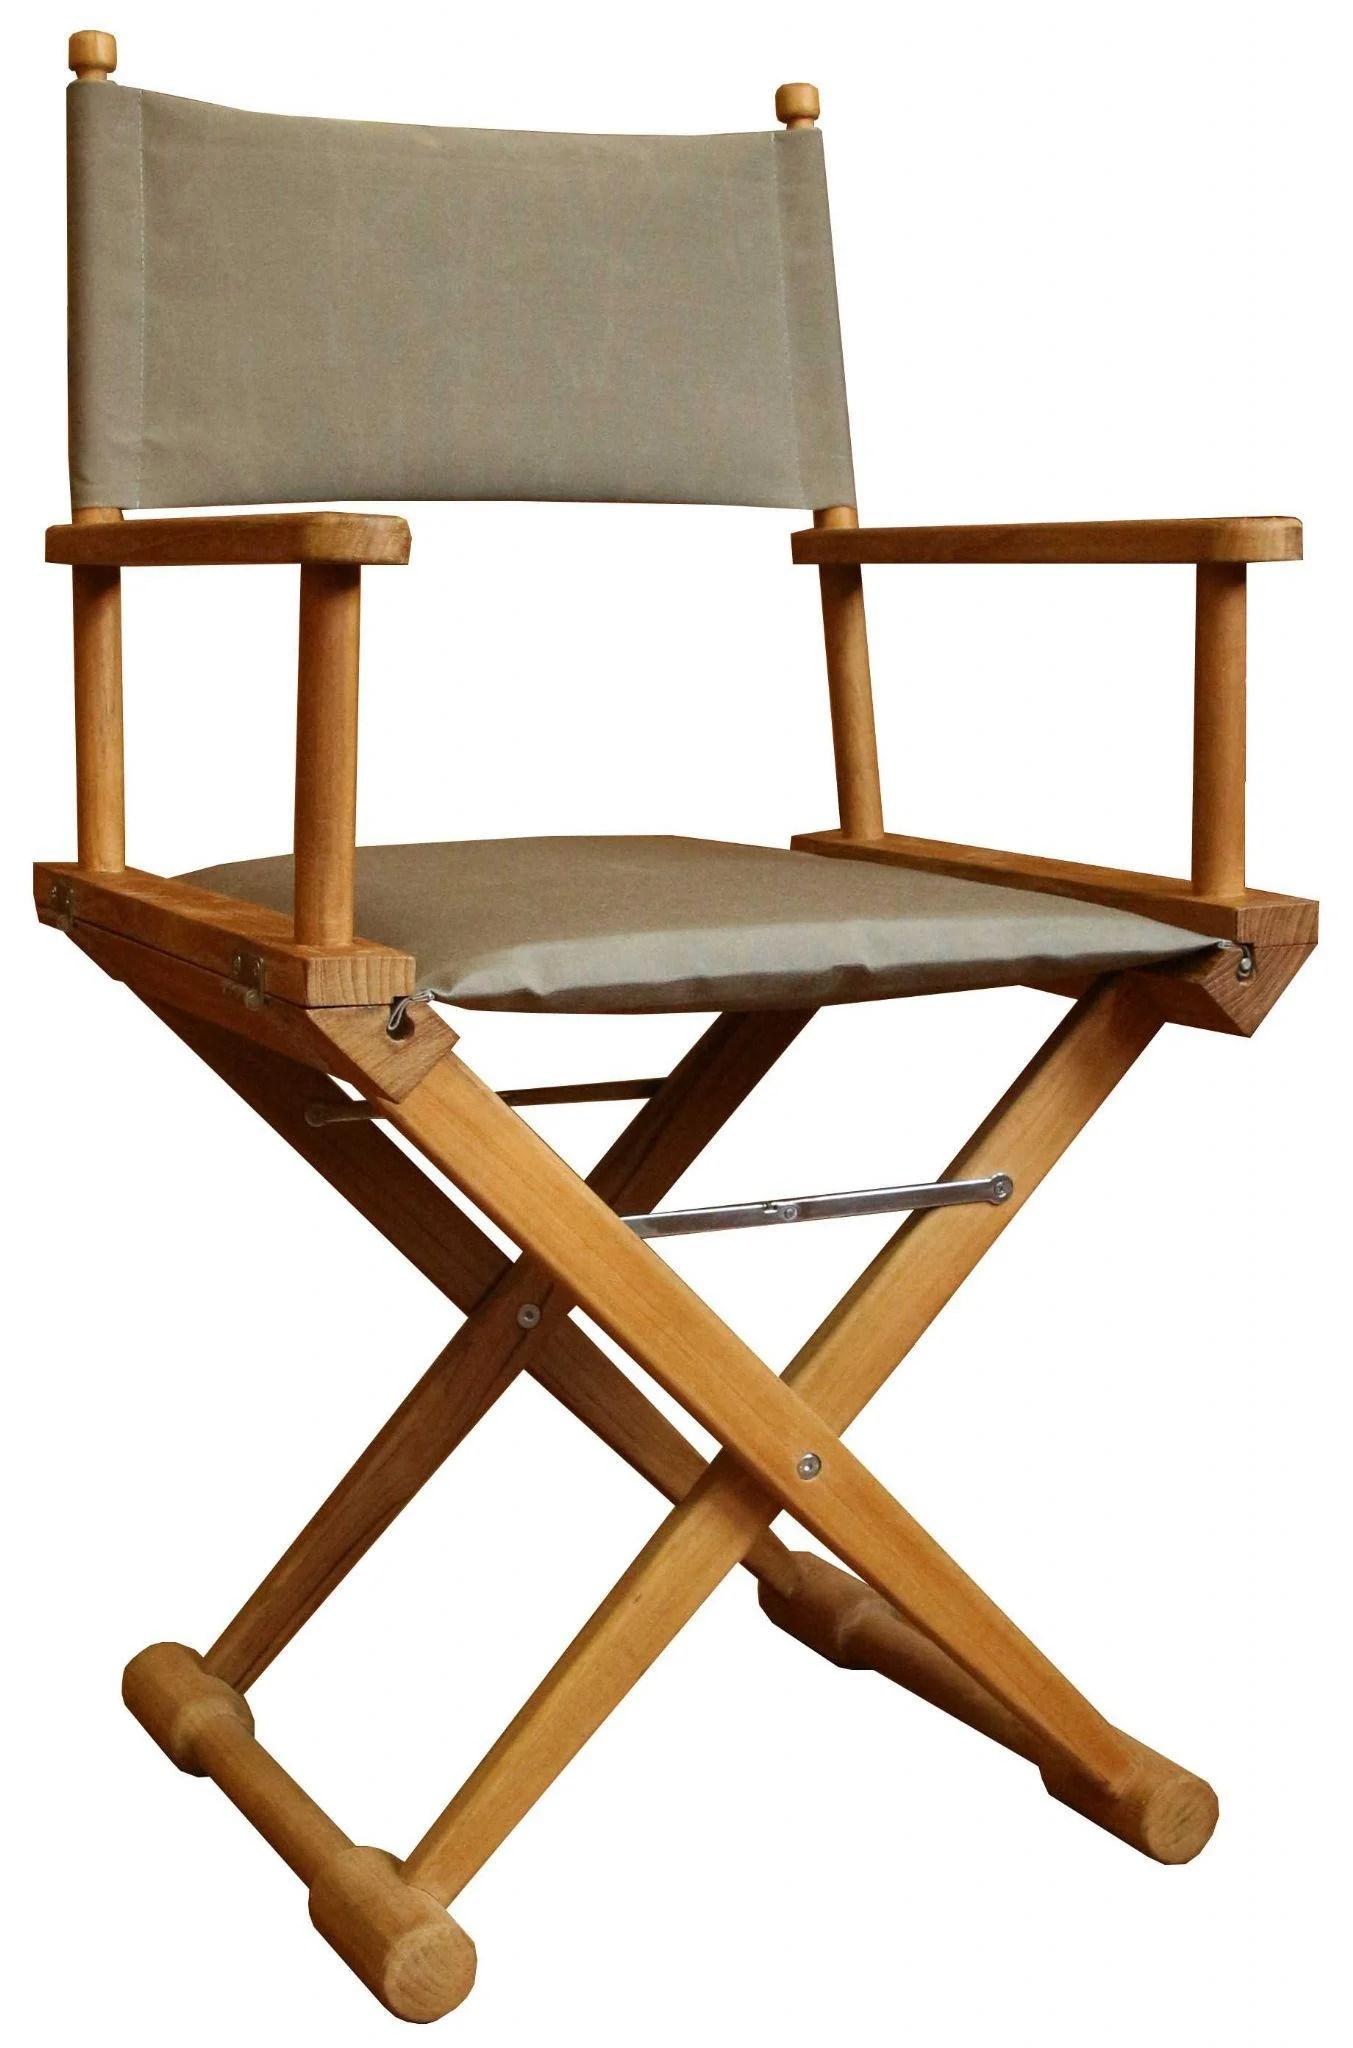 directors chair covers uk european chairs marine teak